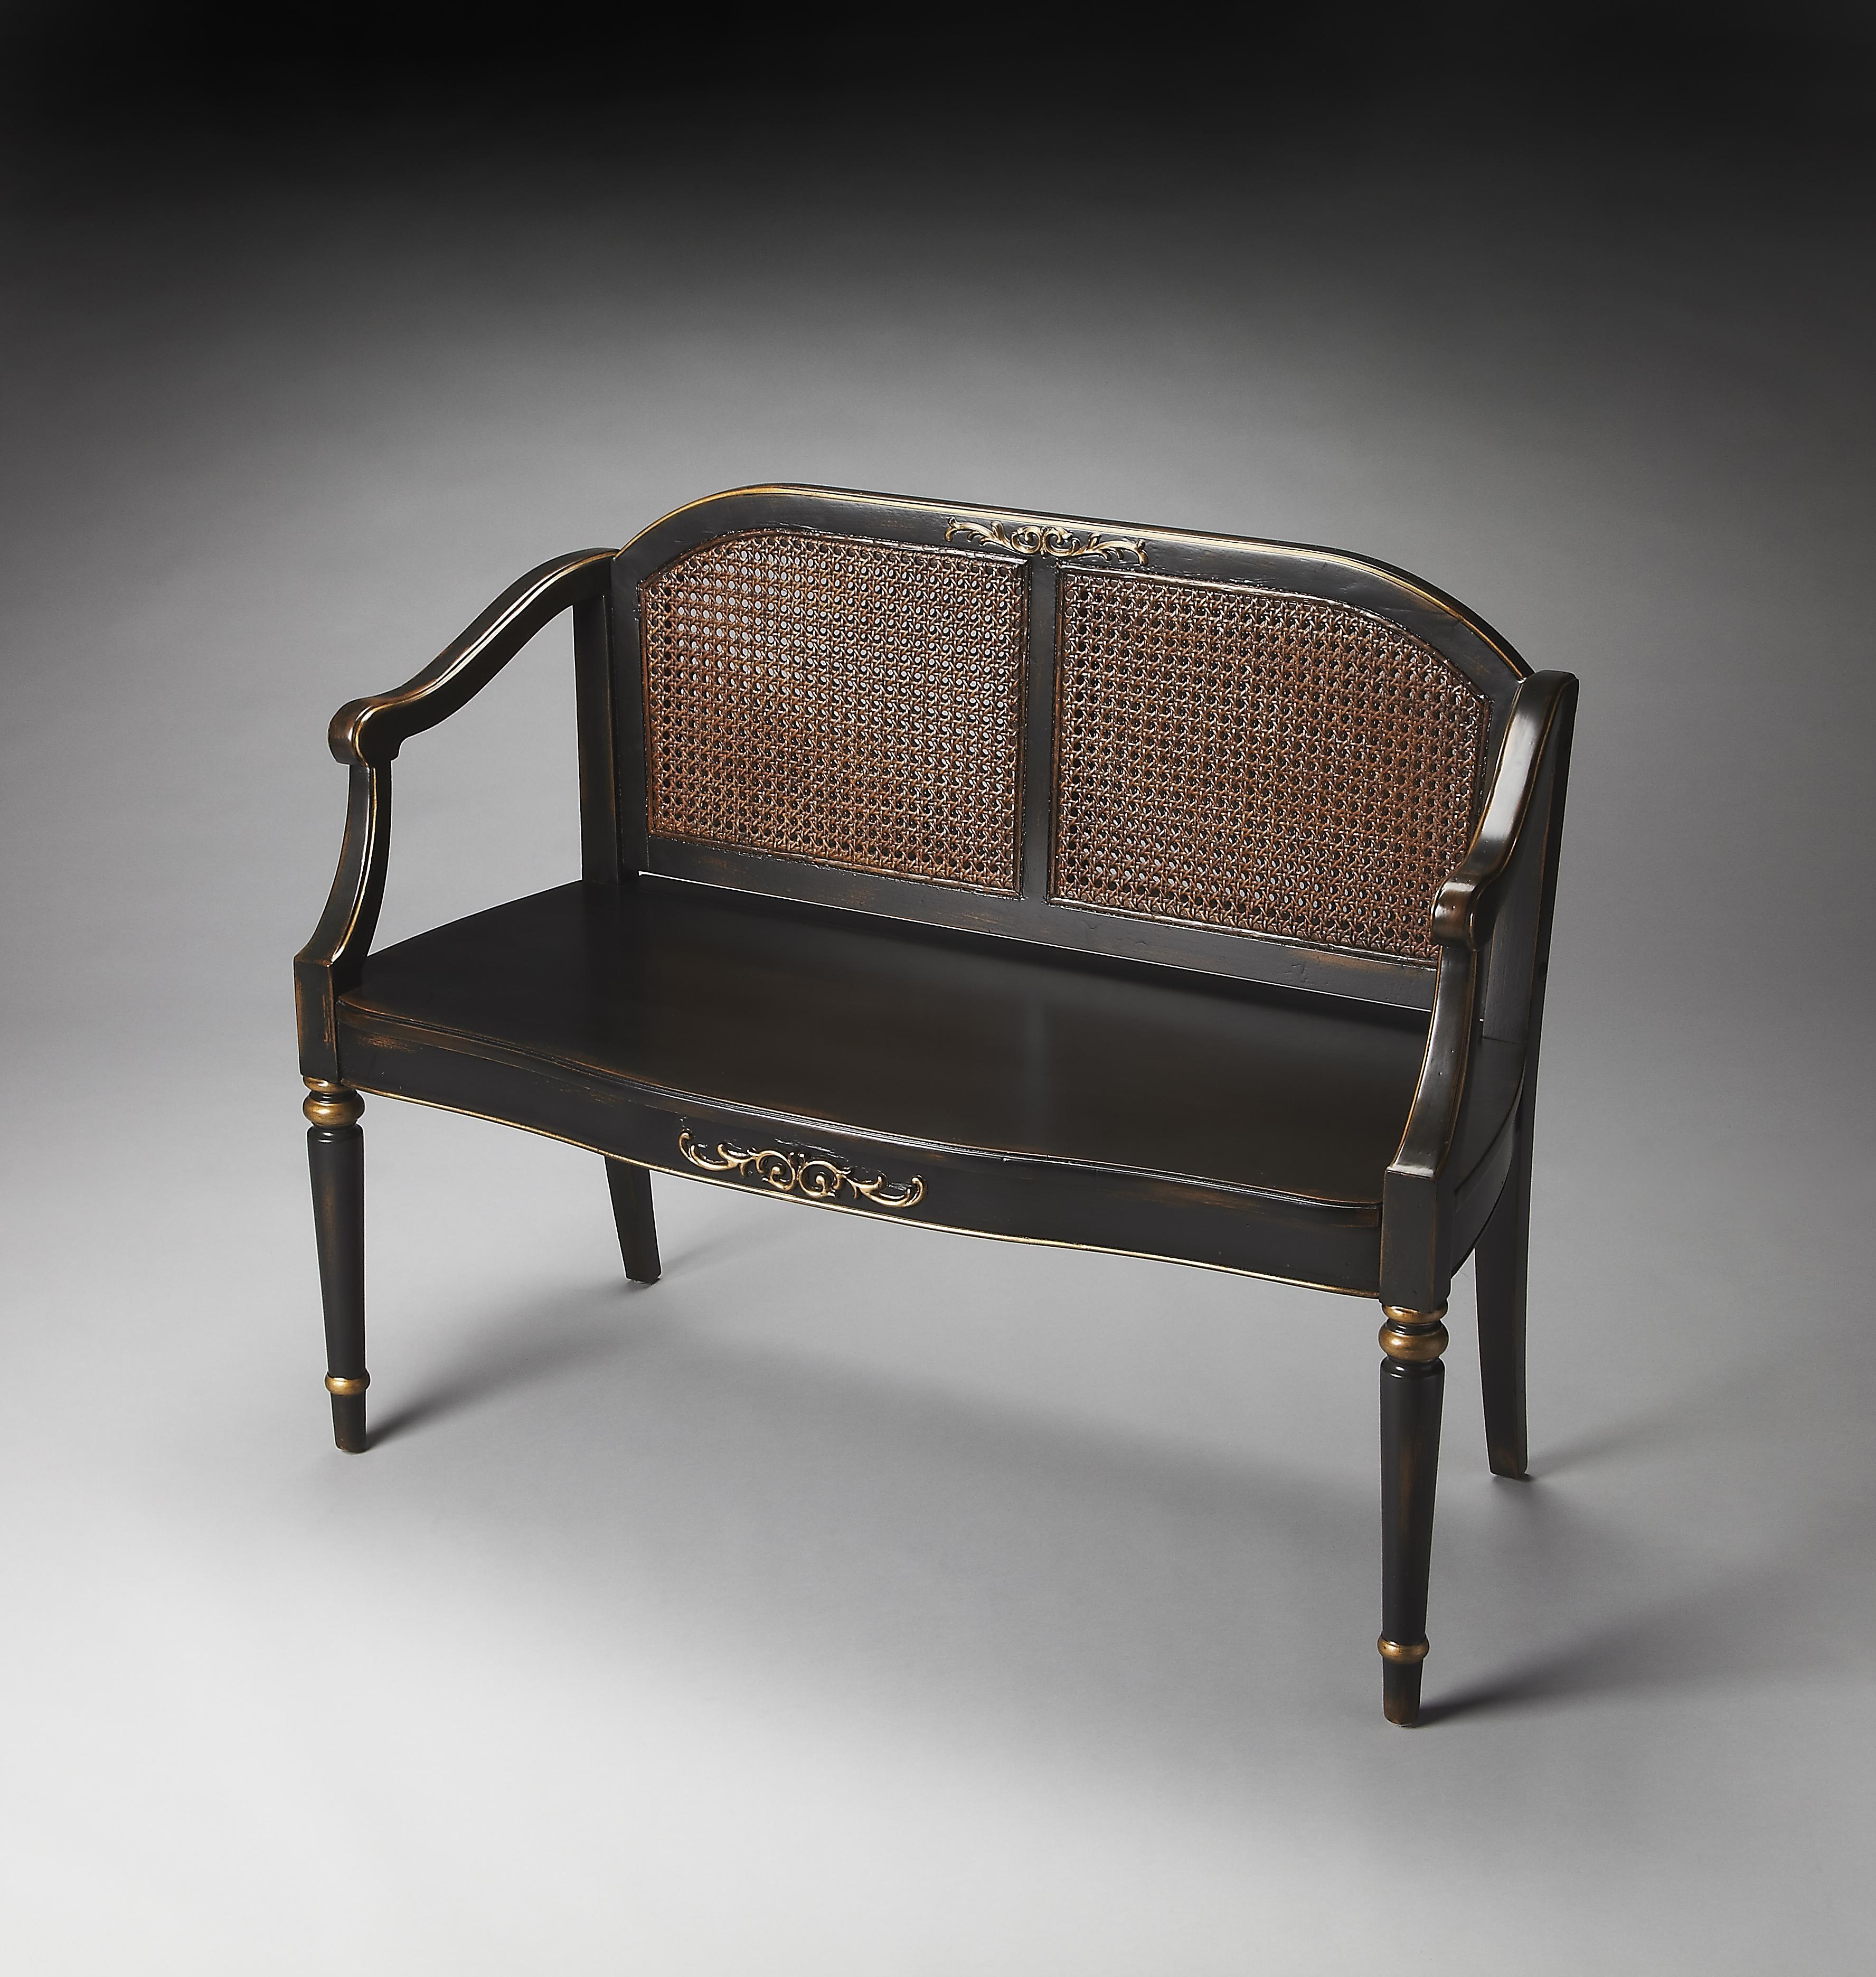 Butler Specialty Company Artist's Originals Bench - Item Number: 1141177